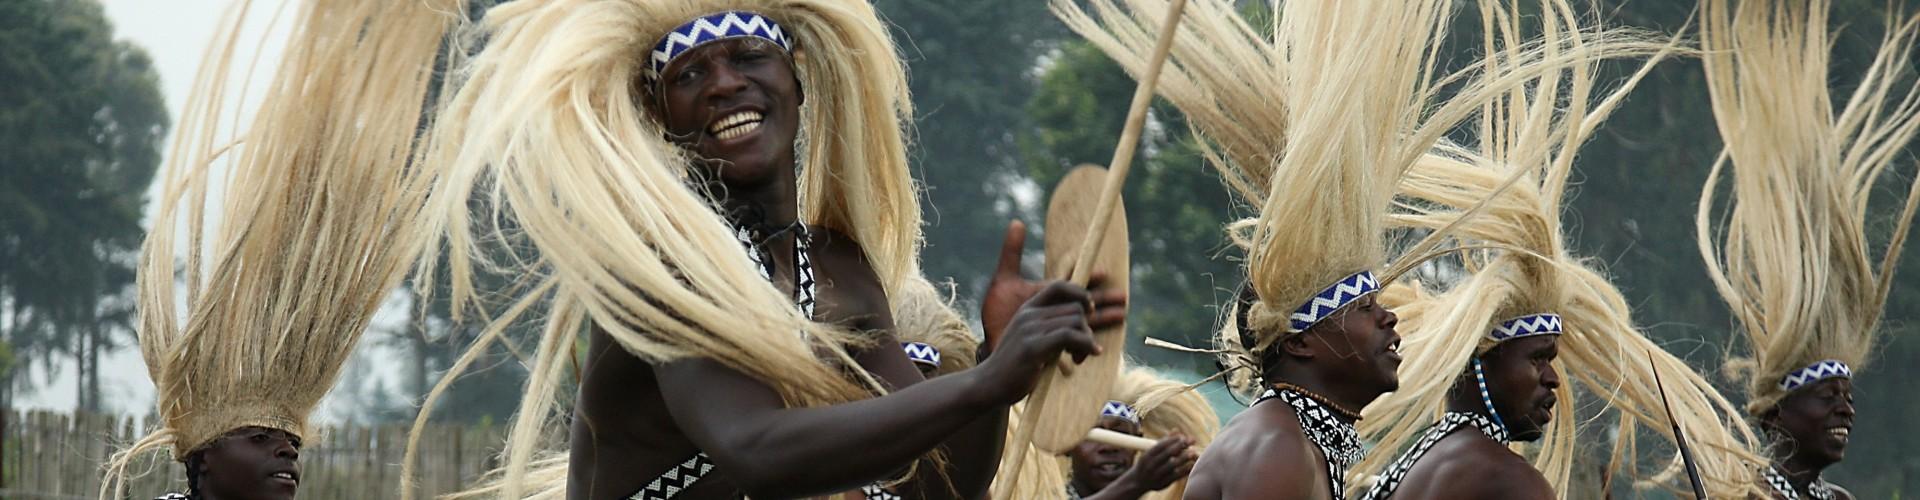 Virunga dancers 1